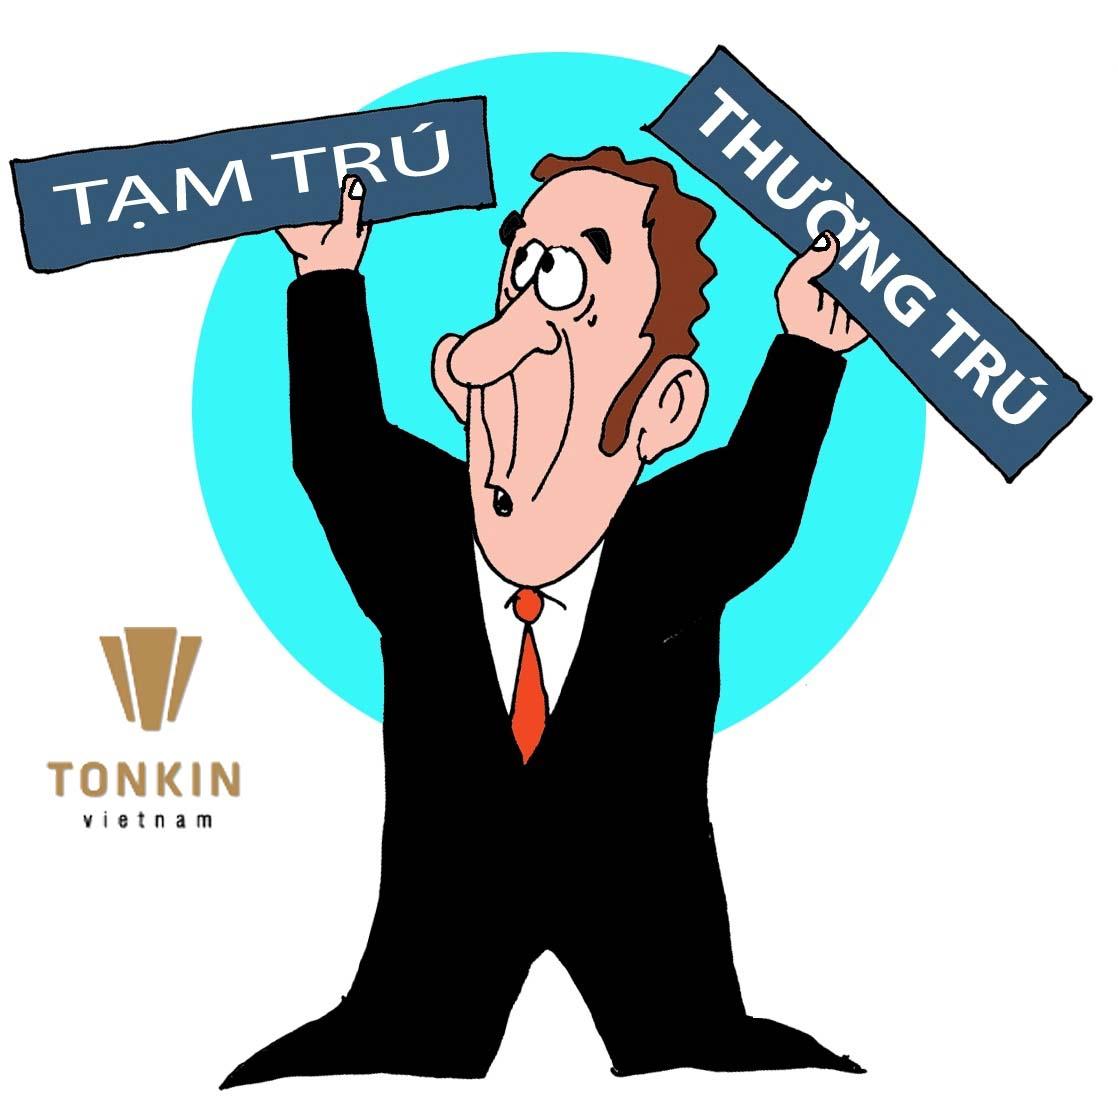 Ho so xin sua lai thong tin tren the tam tru tai Hai Phong